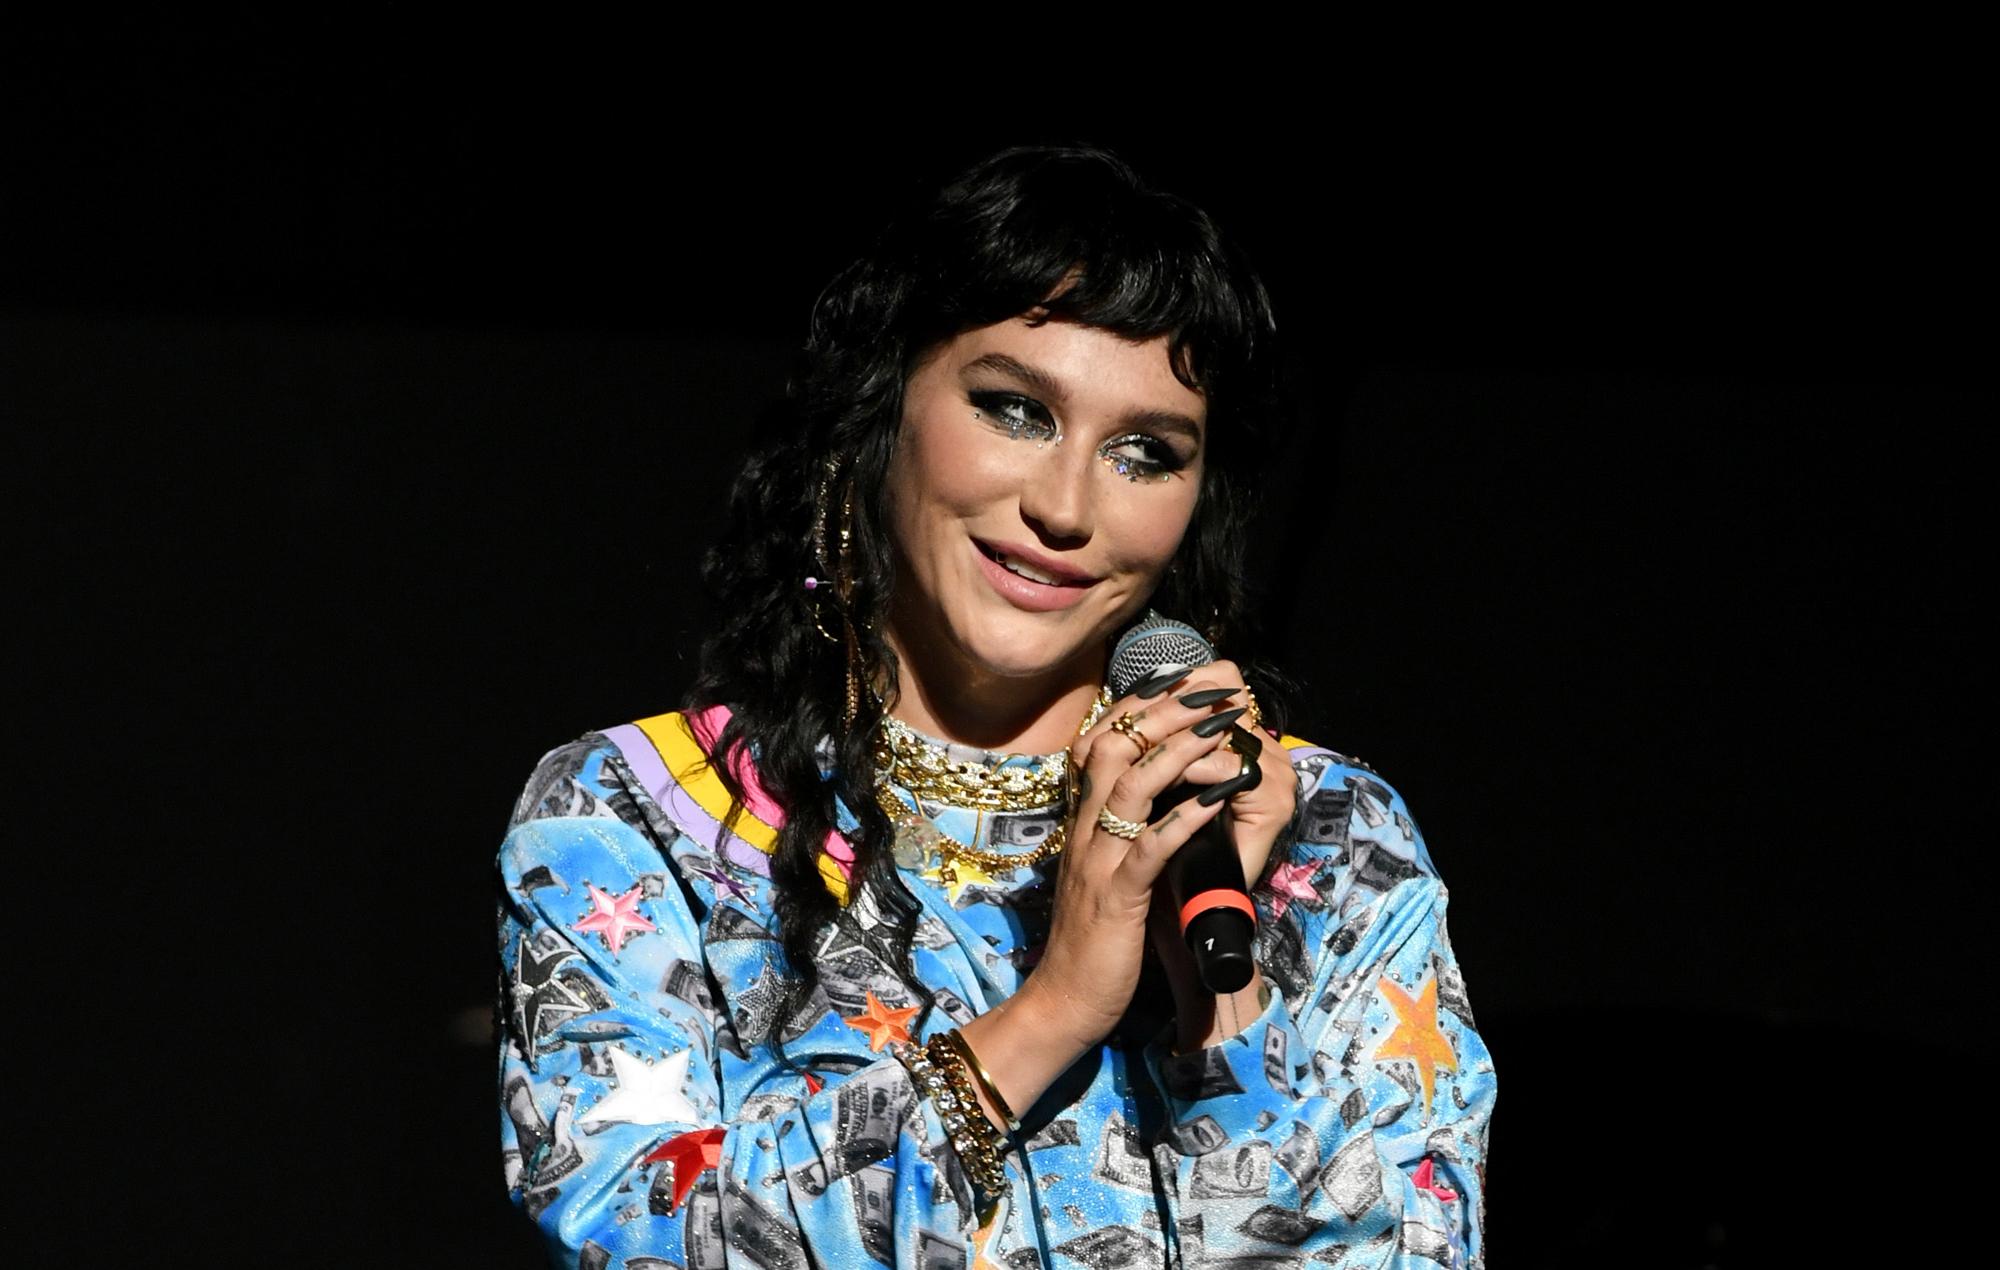 Kesha Digital Fader FORT 2020